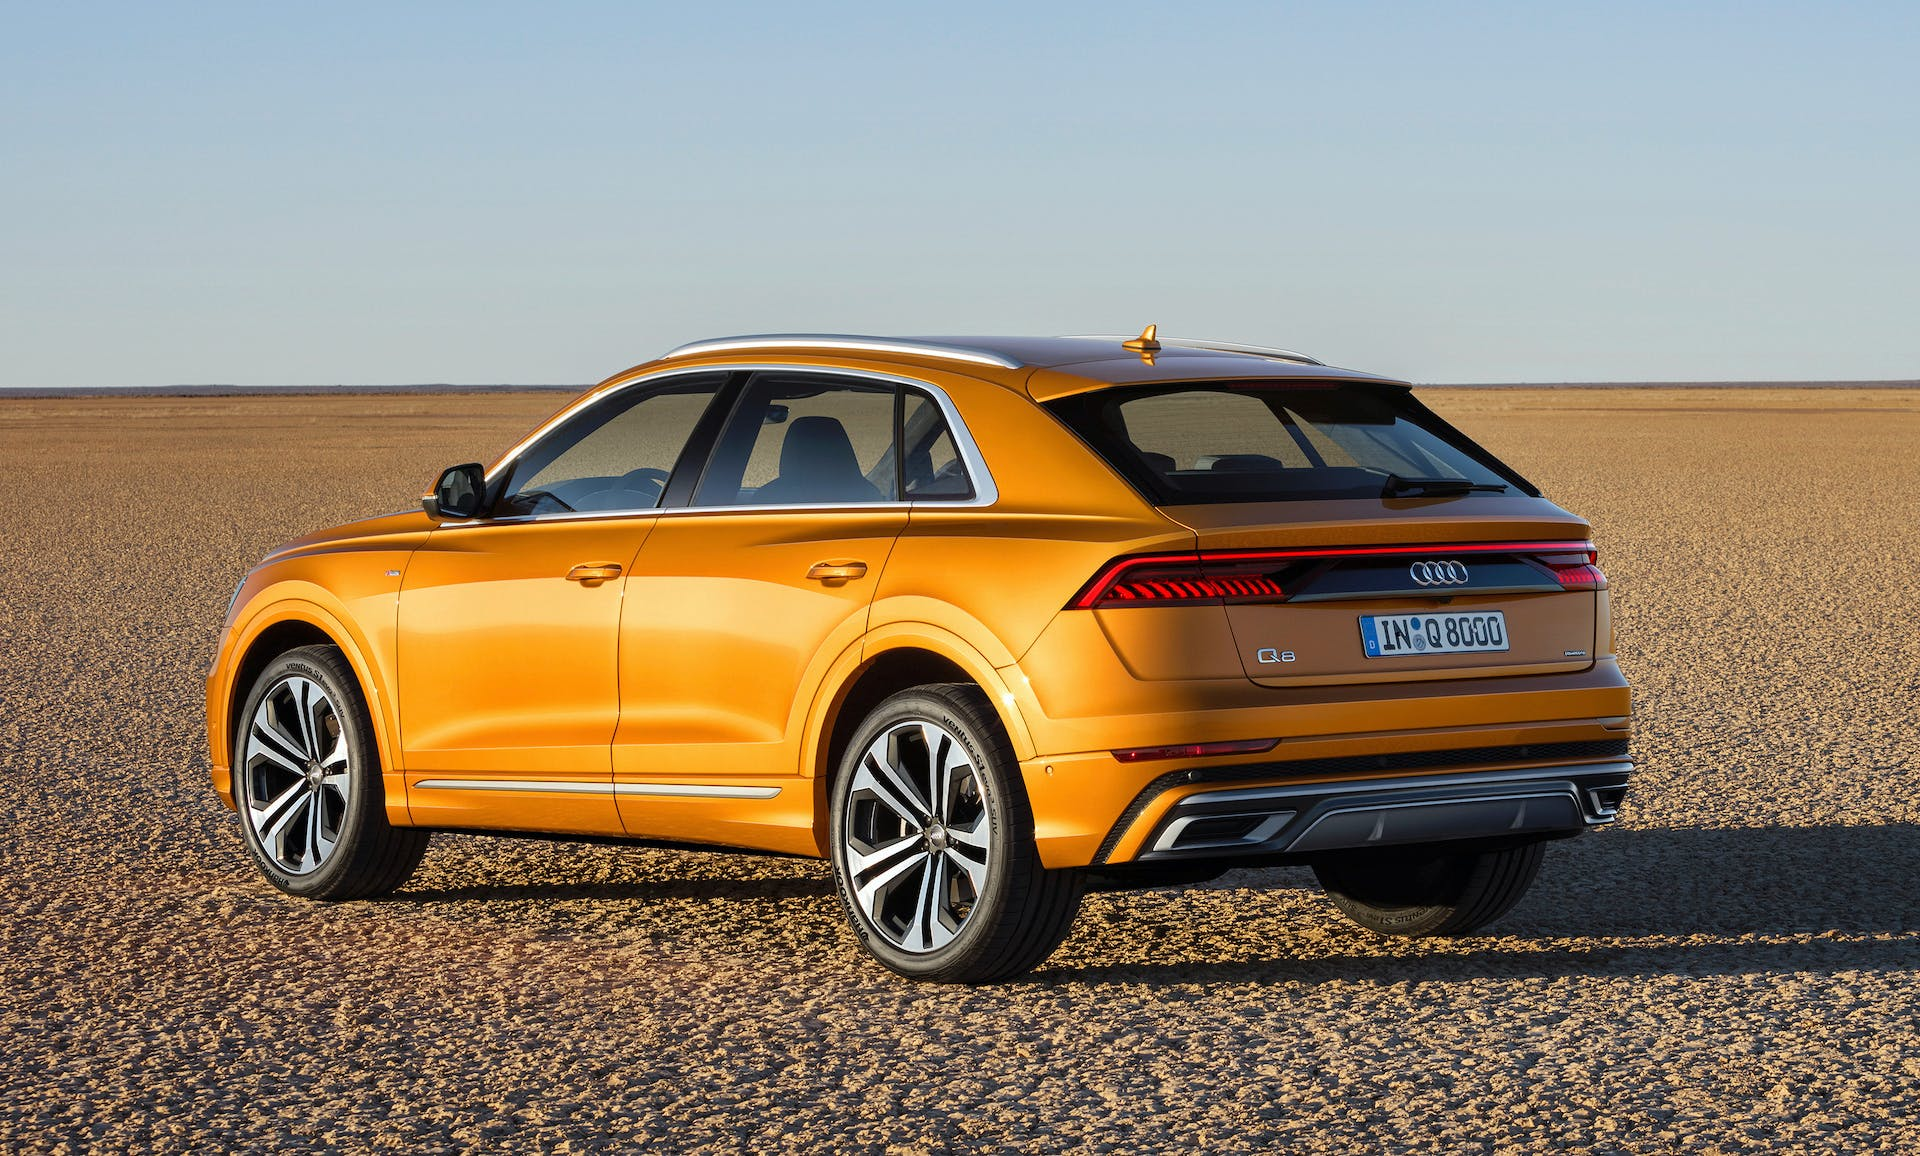 Audi Q8 drangon orange posteriore deserto